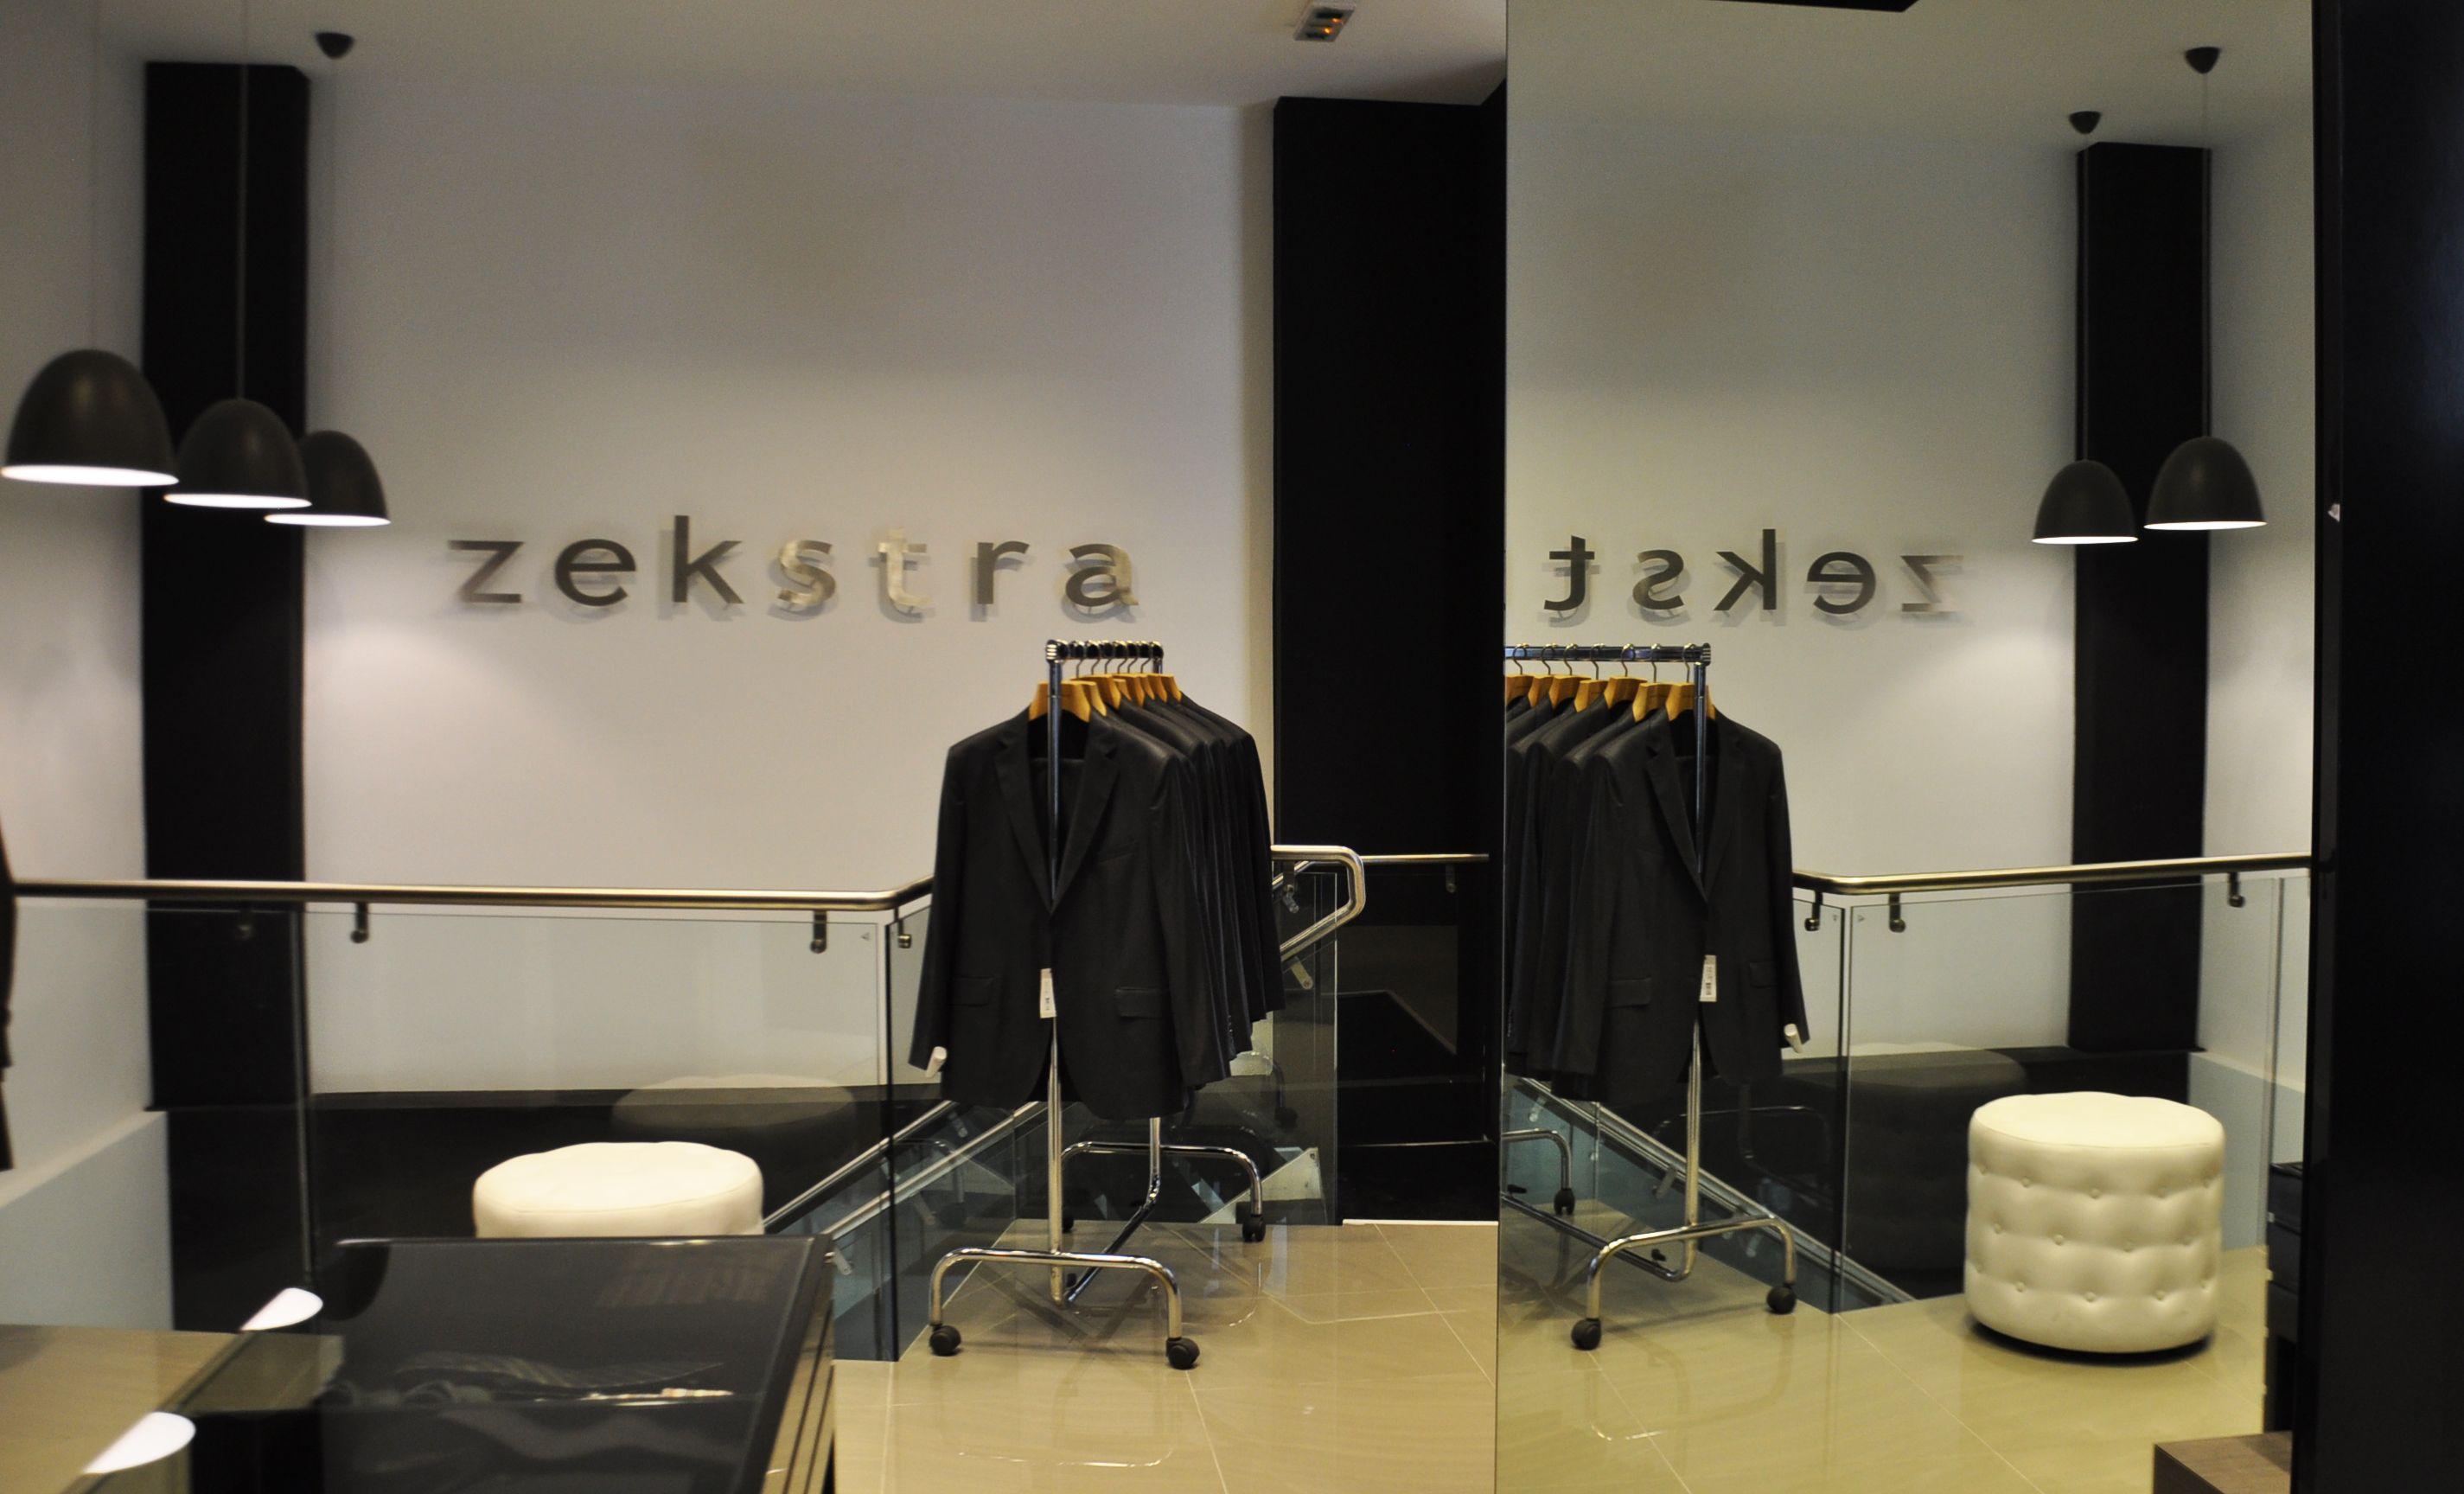 Zekstra Knez Mihailova Street Belgrade Home Decor Decals Fashion Store Design